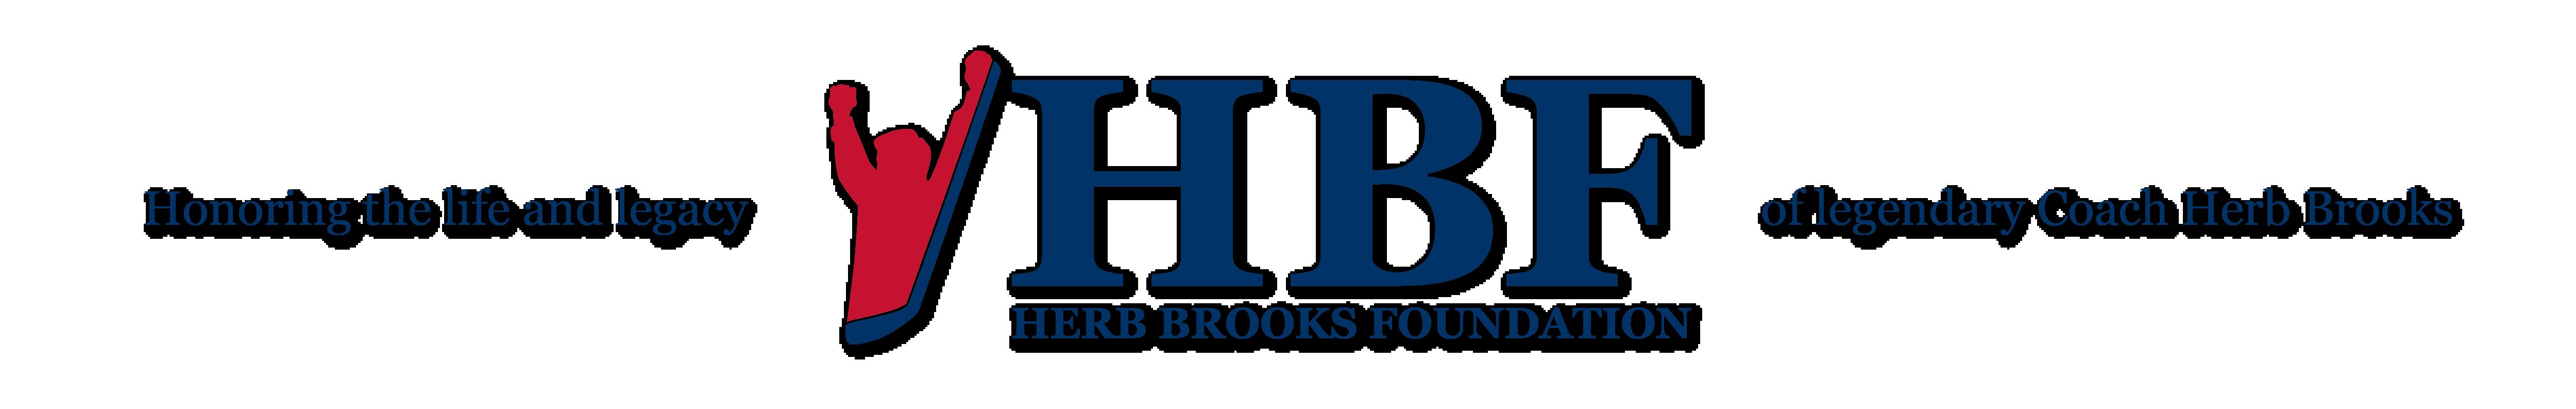 Herbbrooksfdn banner may2018 01